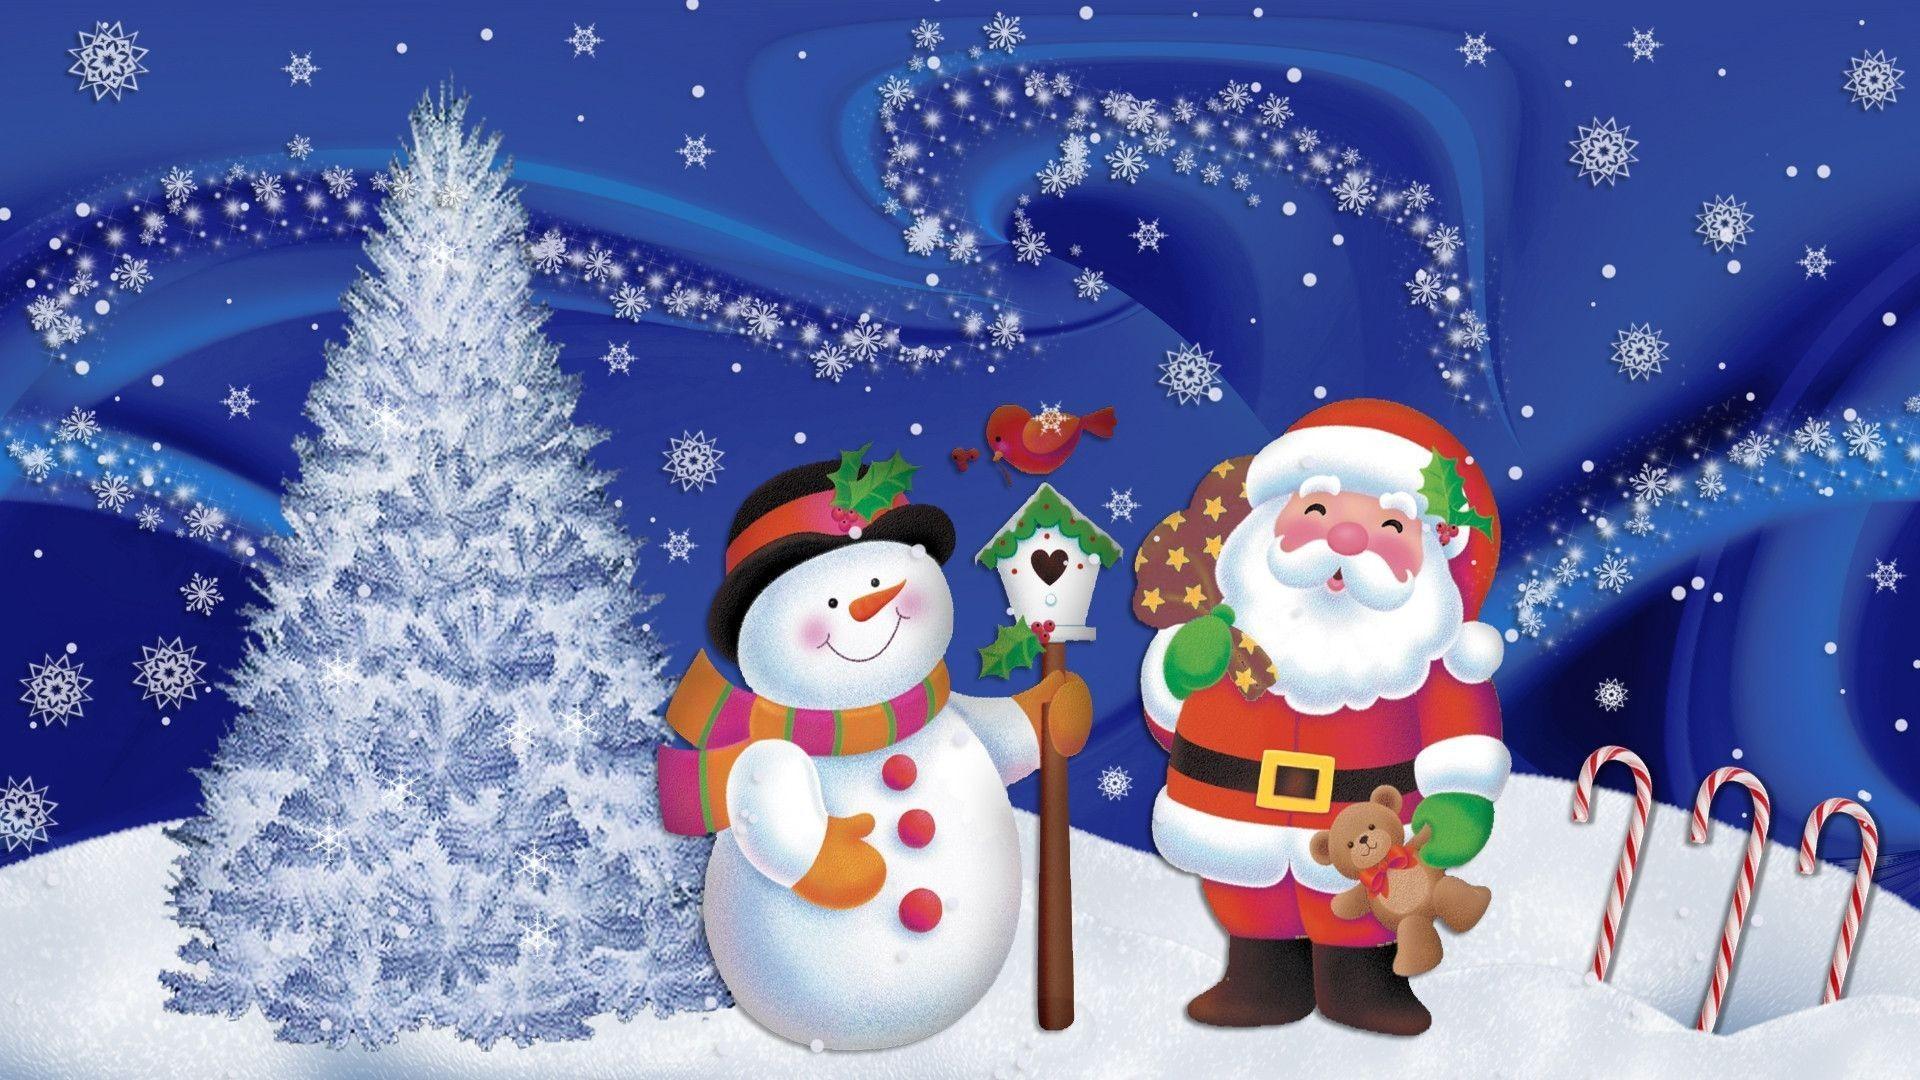 Weihnachtsbilder Merry Christmas.Cowboy Christmas Wallpaper For Desktop 71 Images